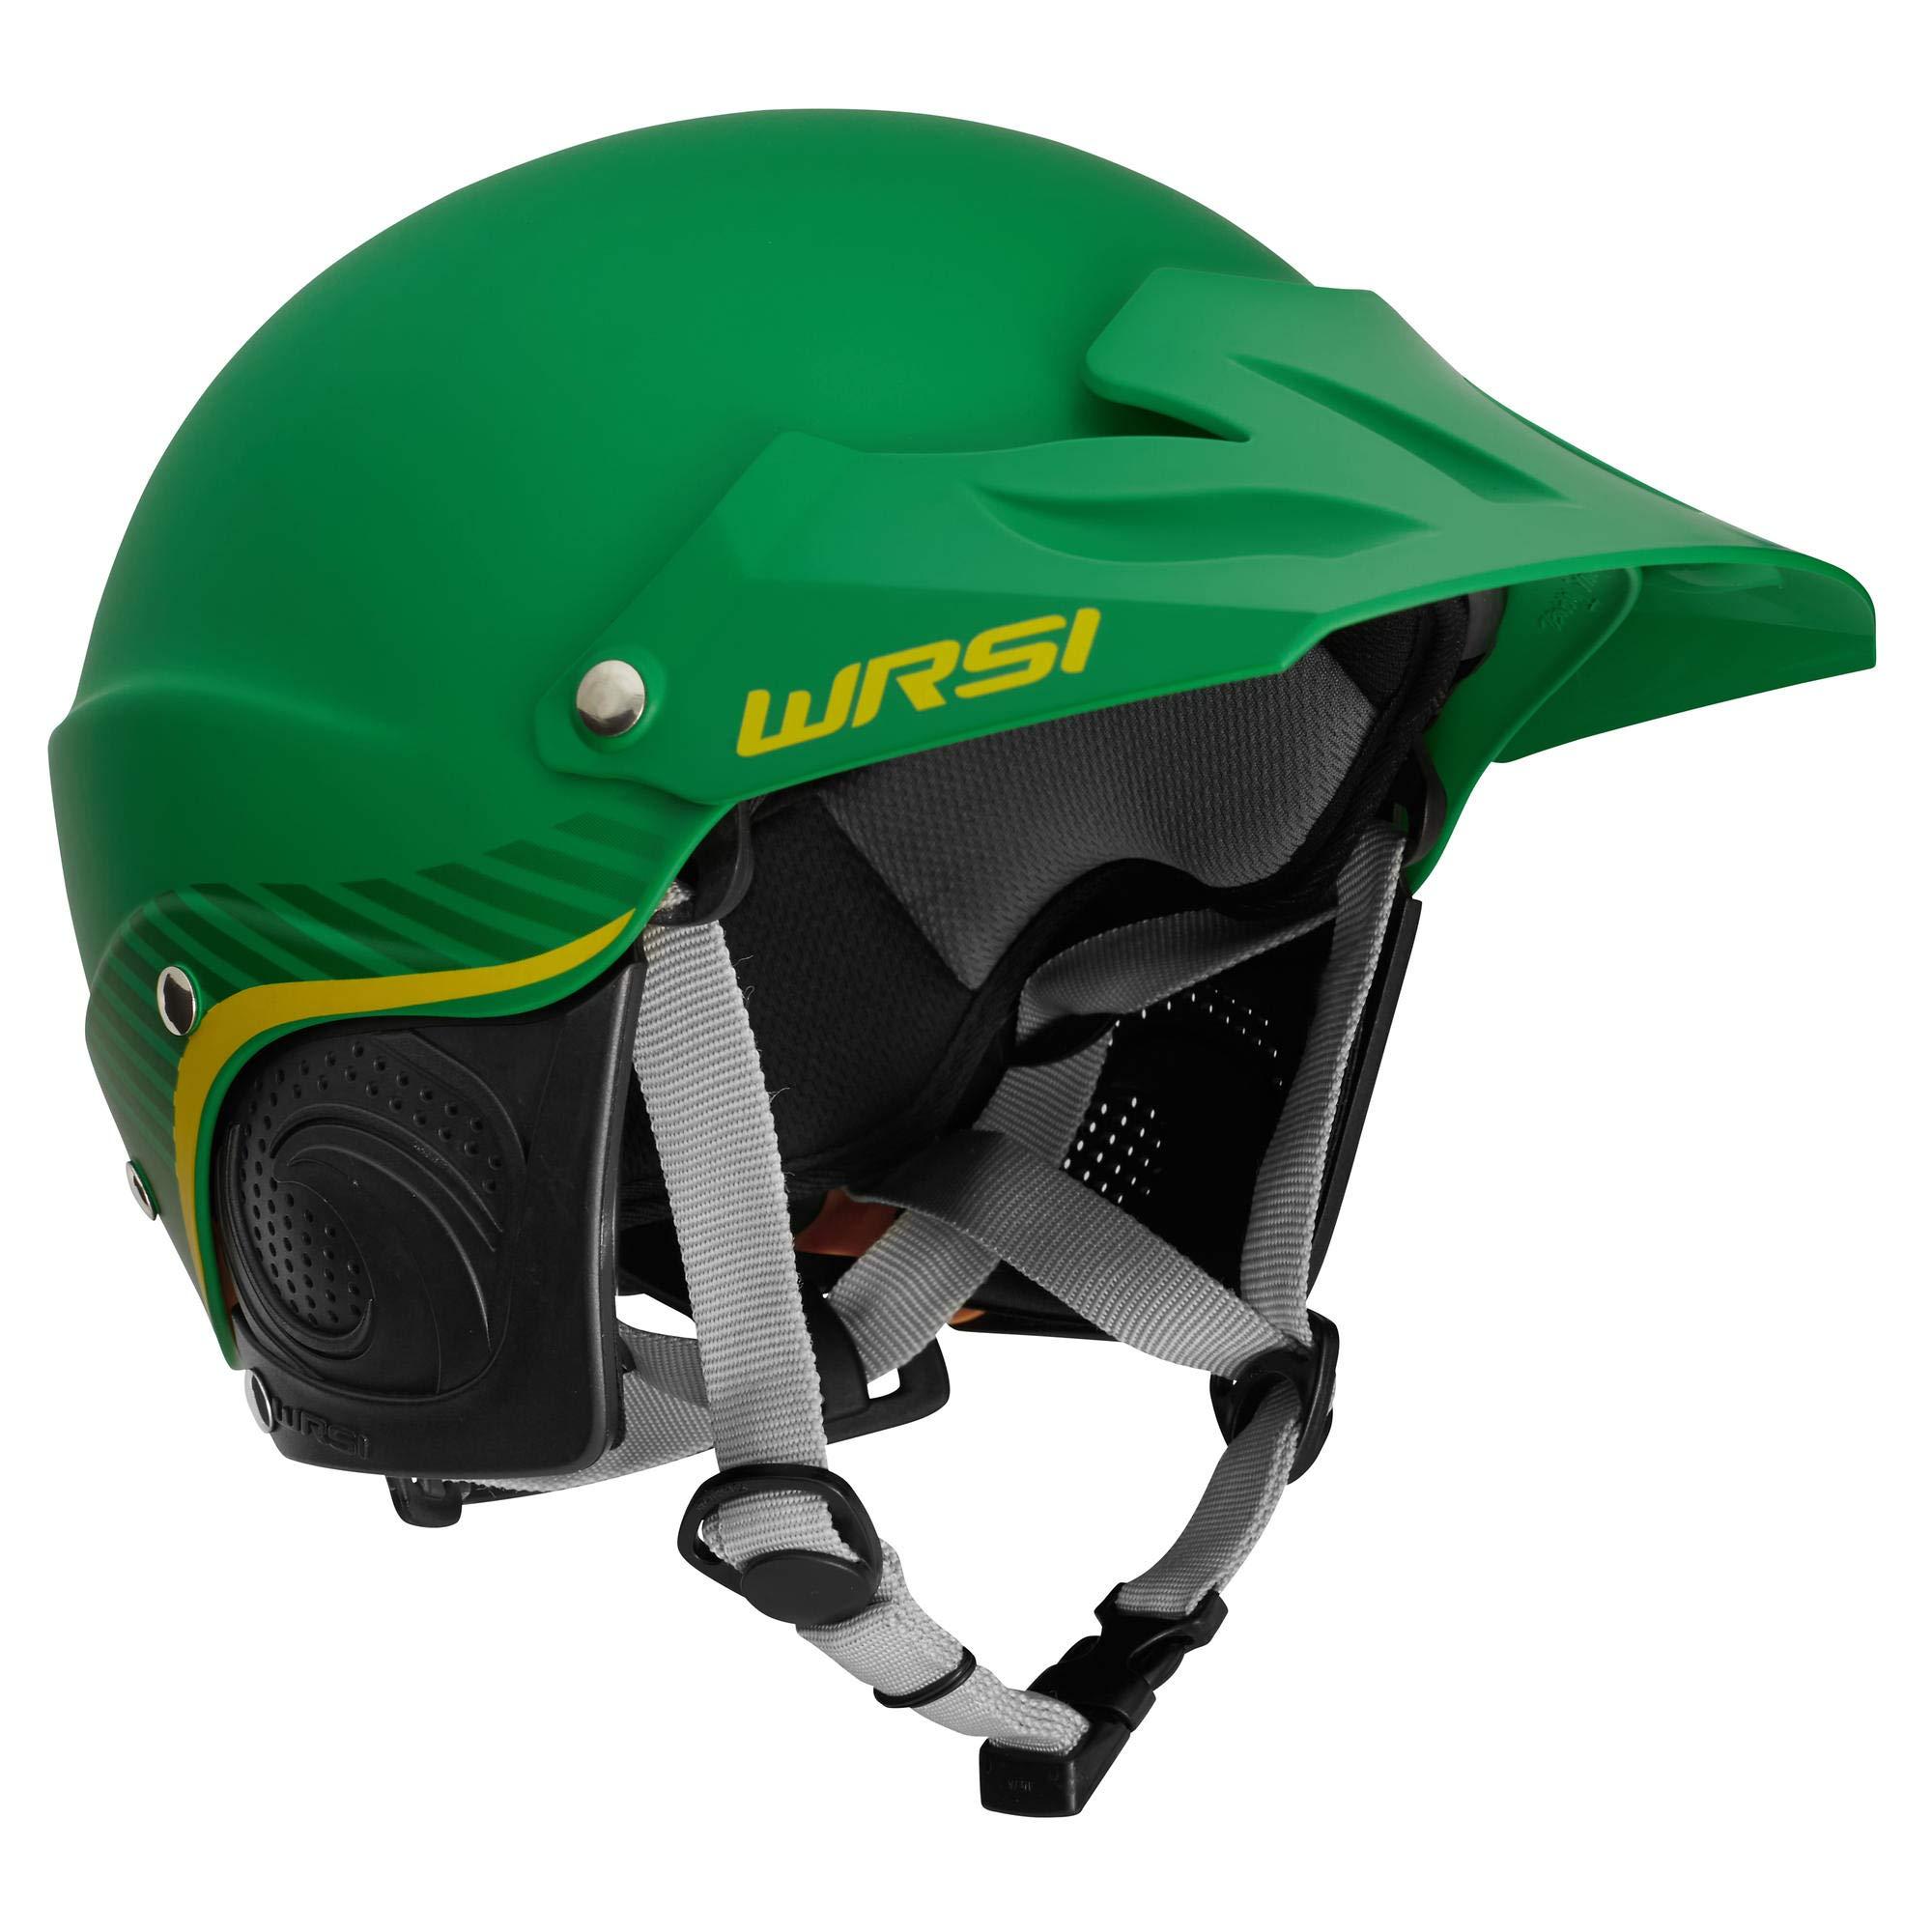 NRS WRSI Current Pro Helmet, Shamrock - Medium/Large by NRS